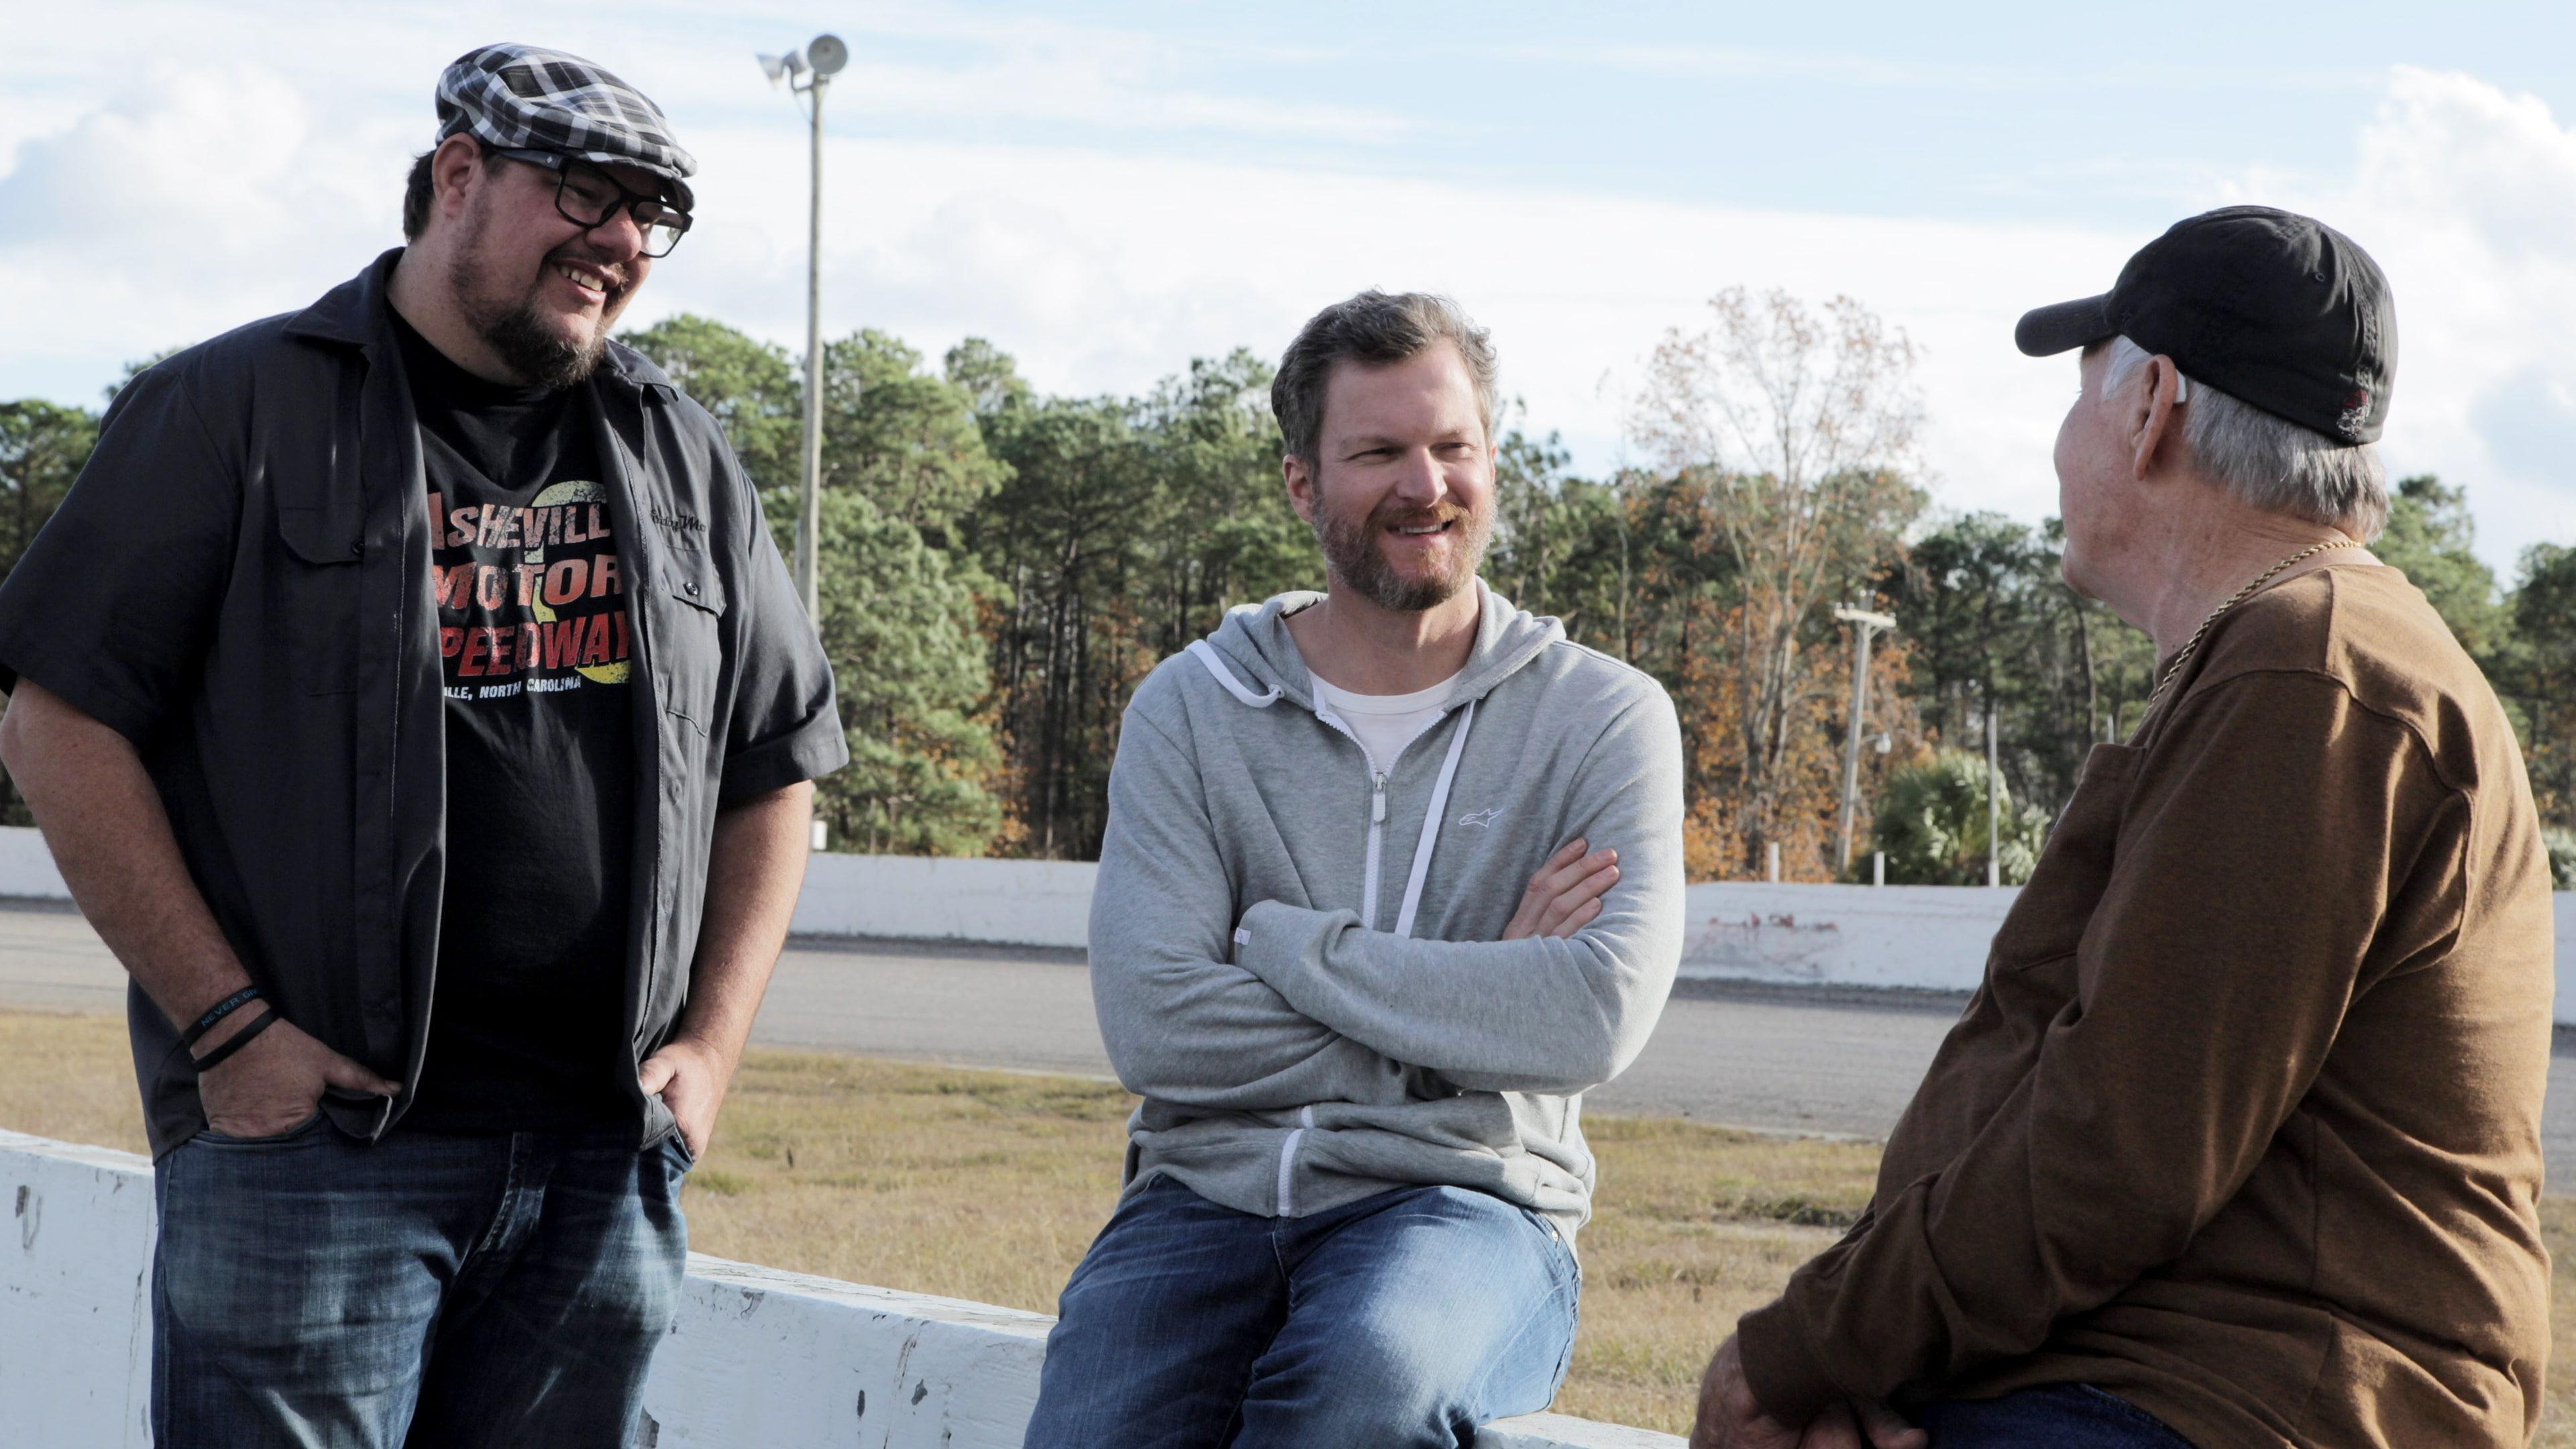 Myrtle Beach Speedway: Goodbye, Dear Friend